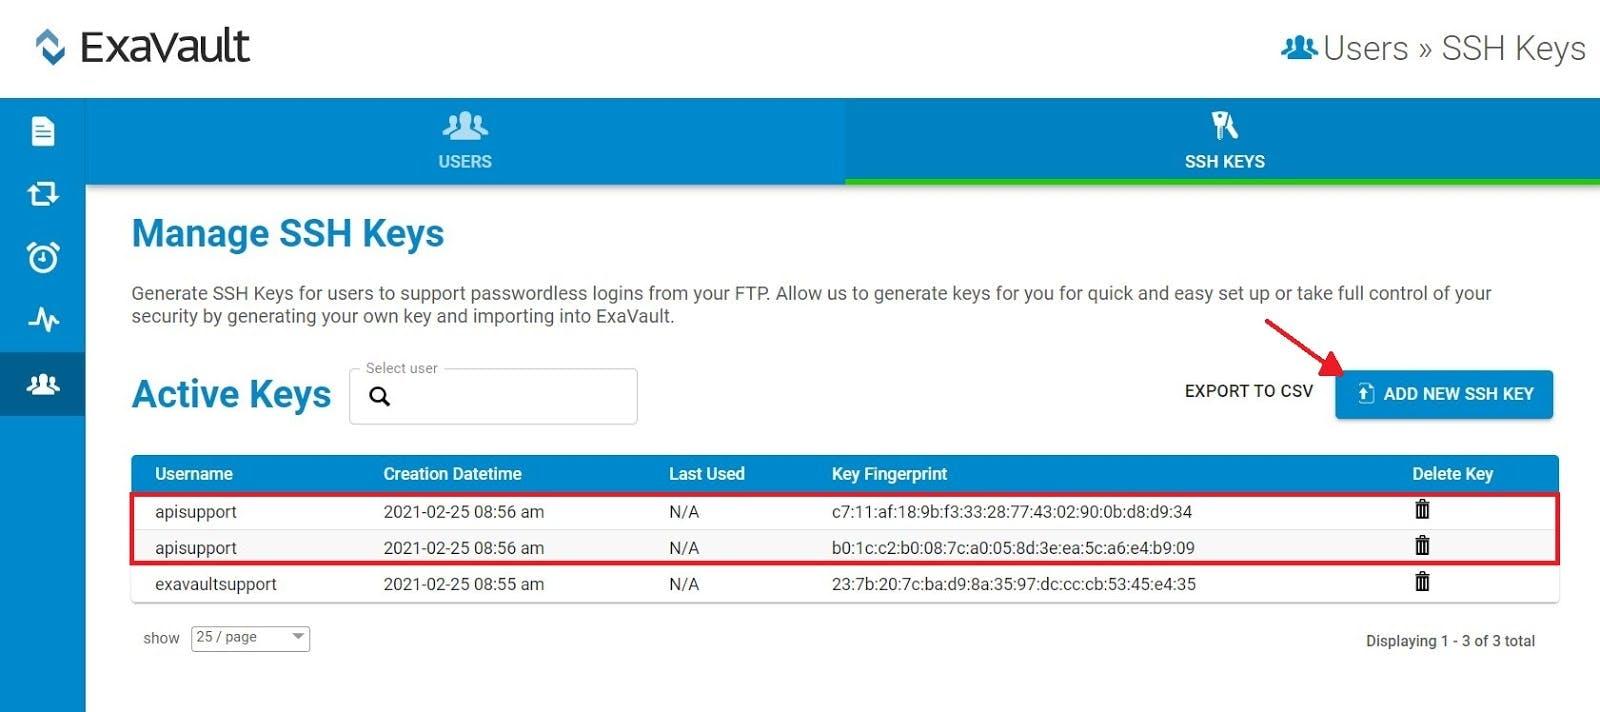 ExaVault SSH key management interface.